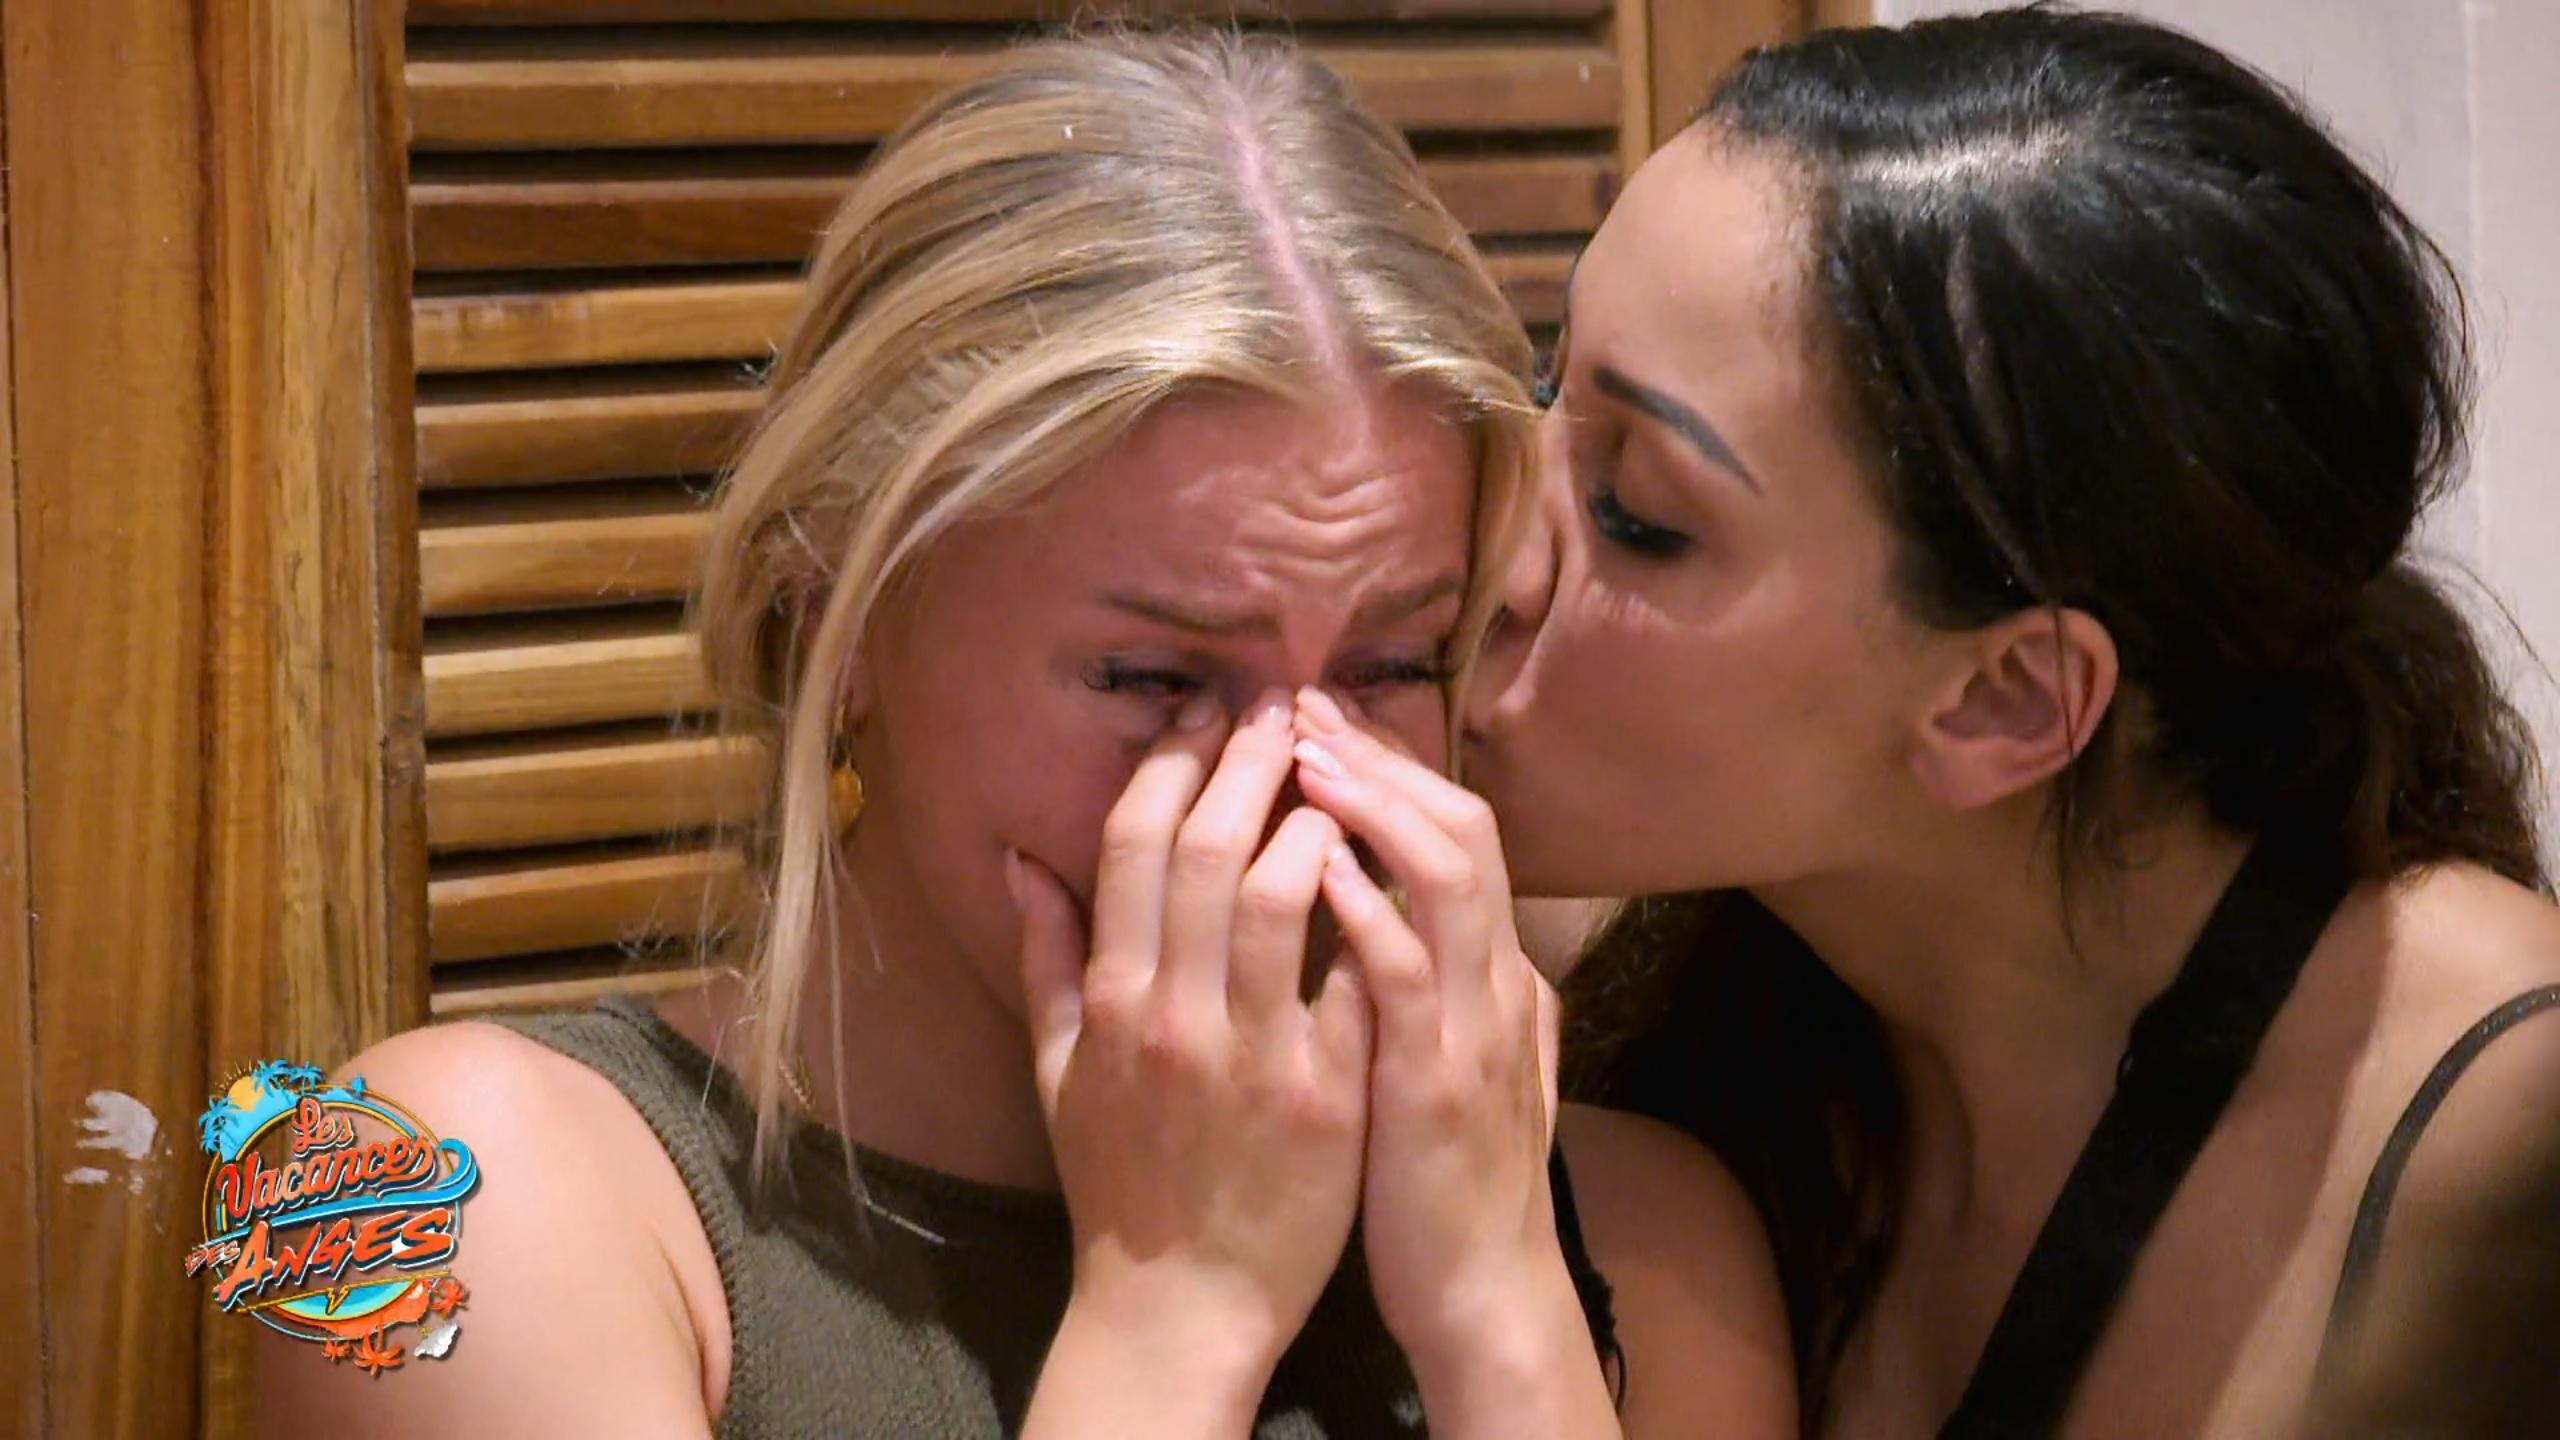 LVDA4 : Éliminée par Angèle Salentino, Emma Keitmann s'effondre !